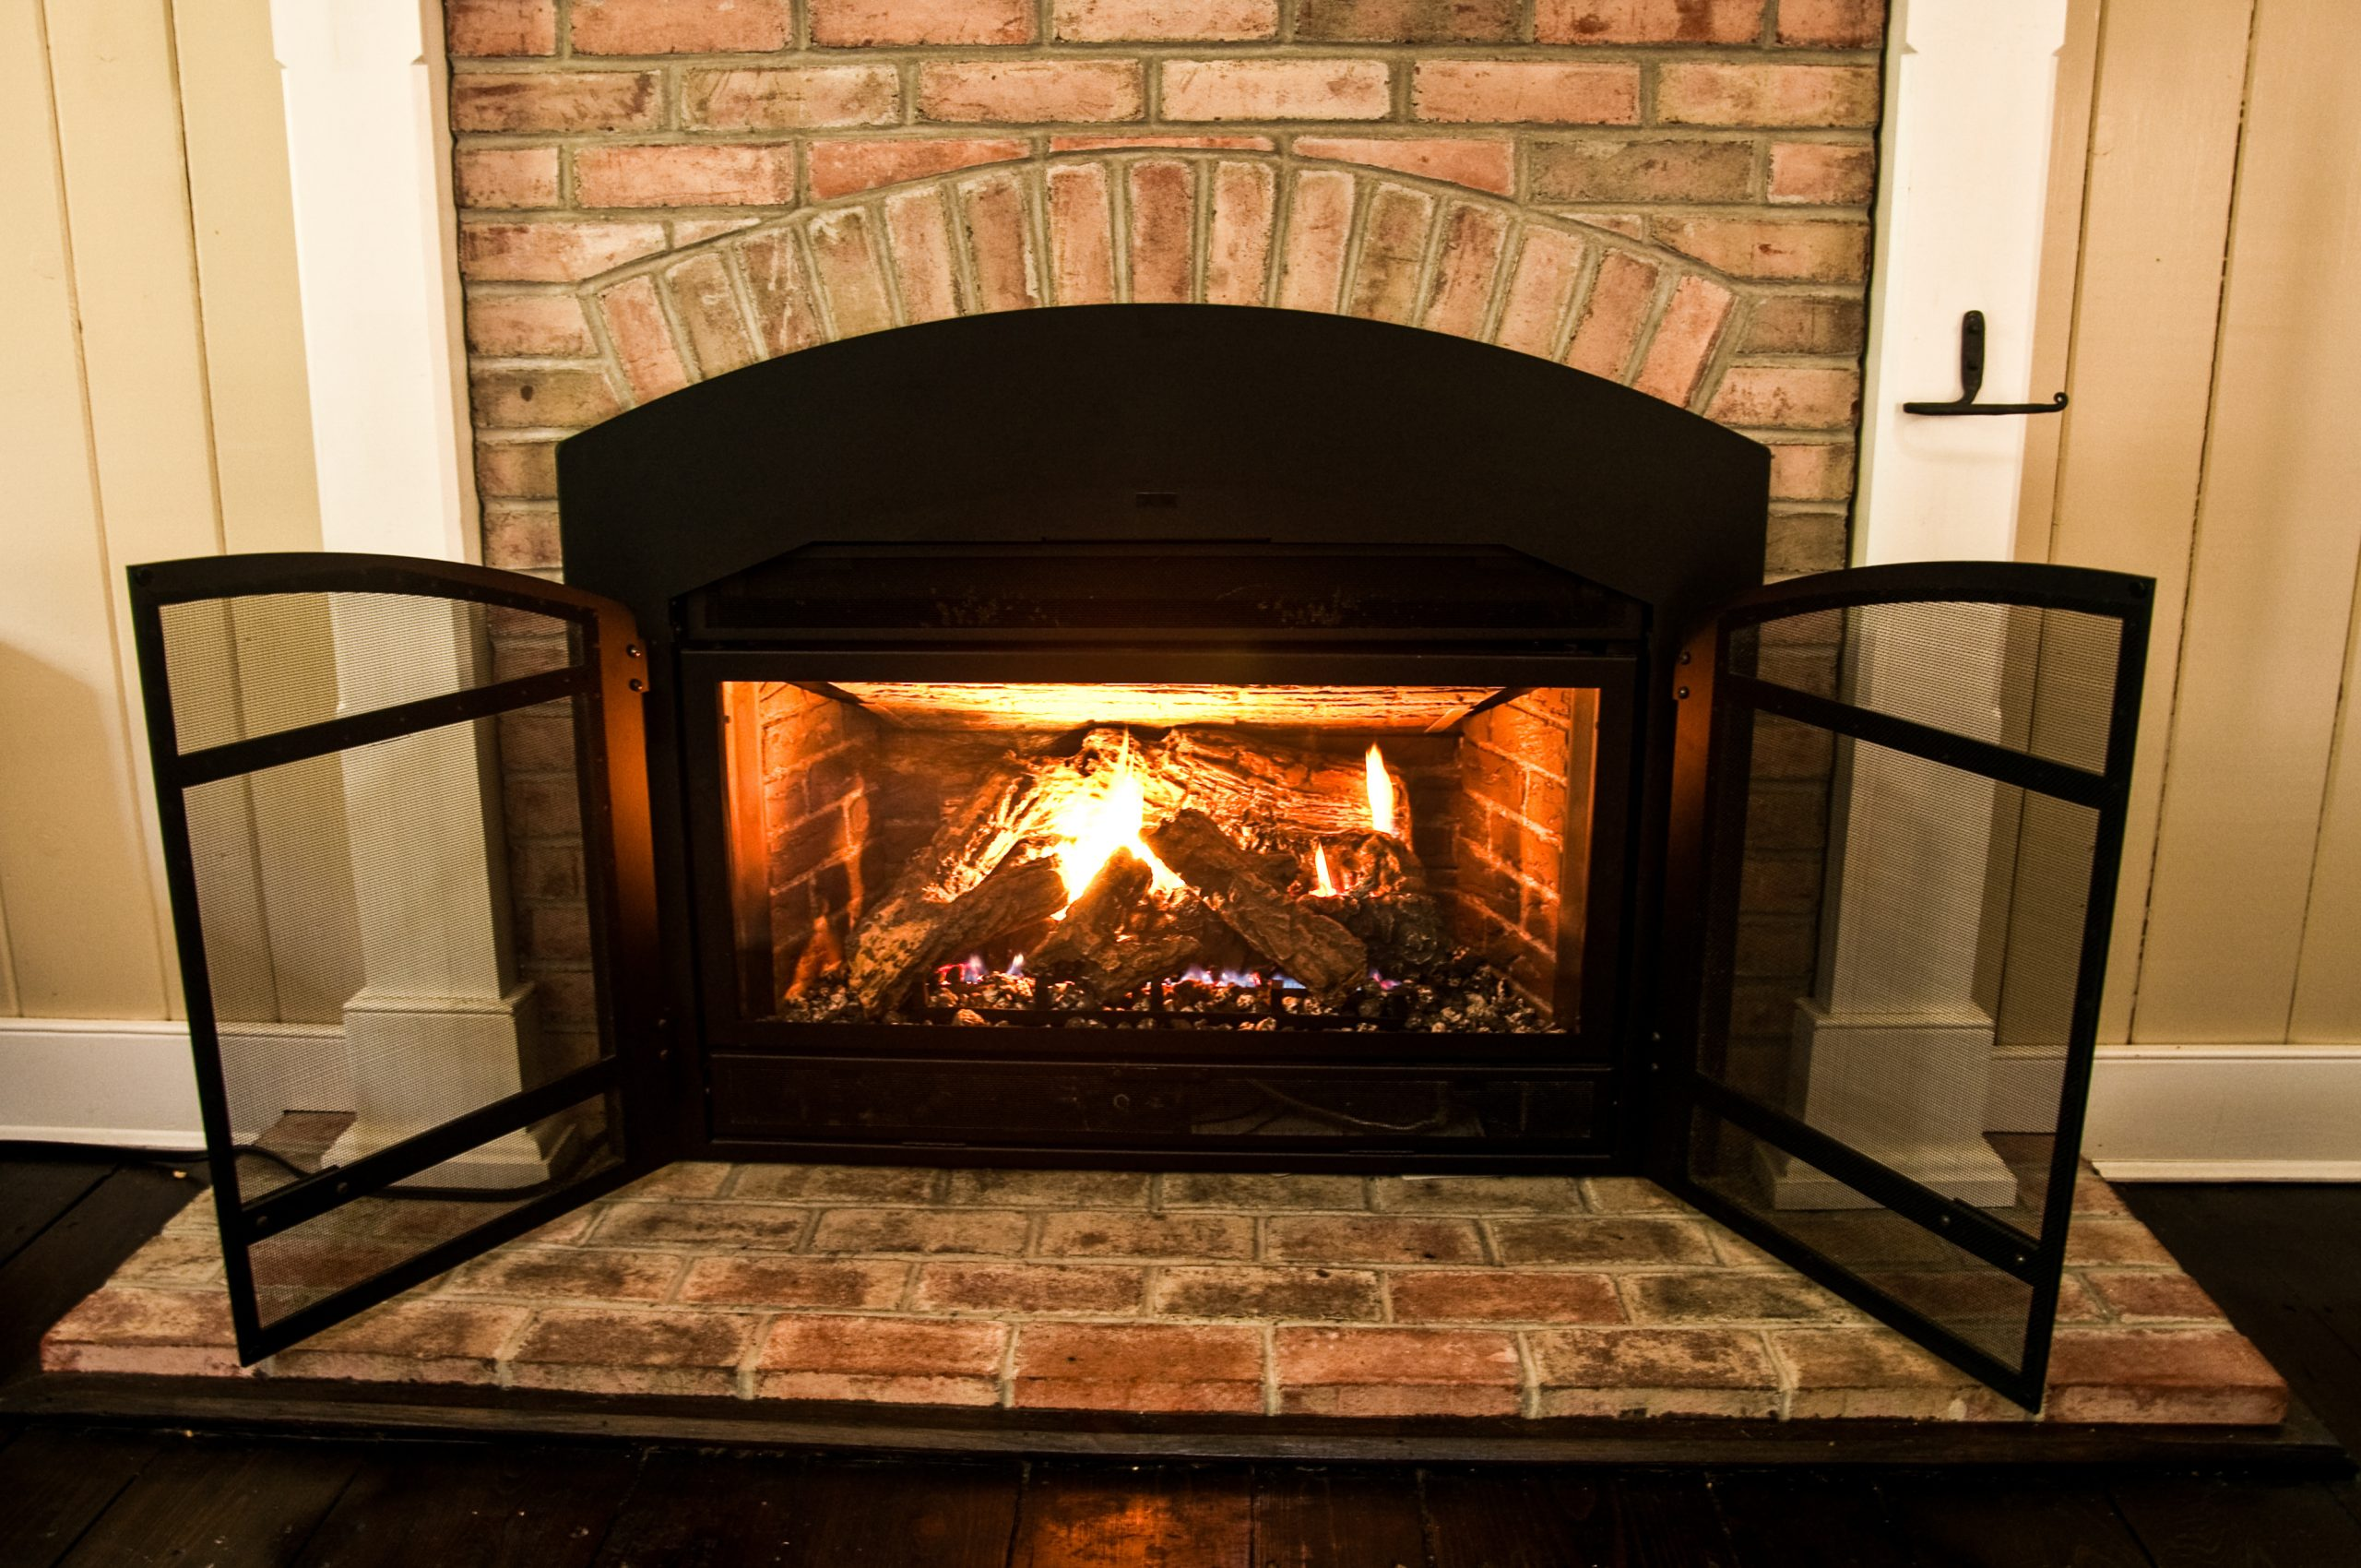 Gas Fireplace Insert on brick hearth